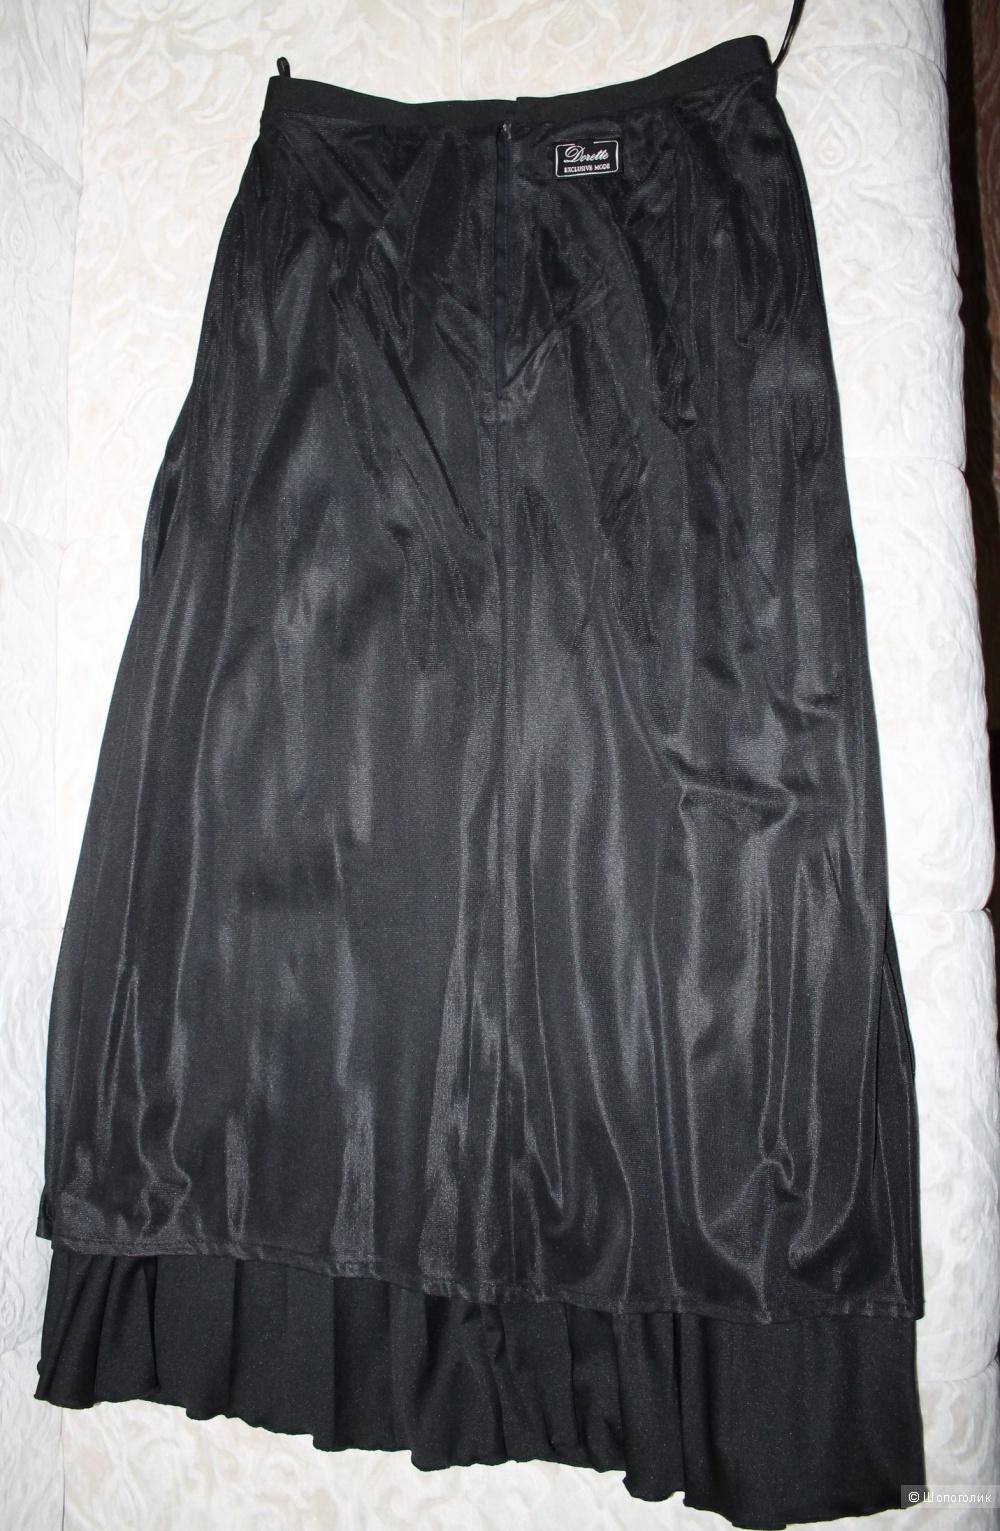 Юбка-плиссе Dorette, размер 46 - 48